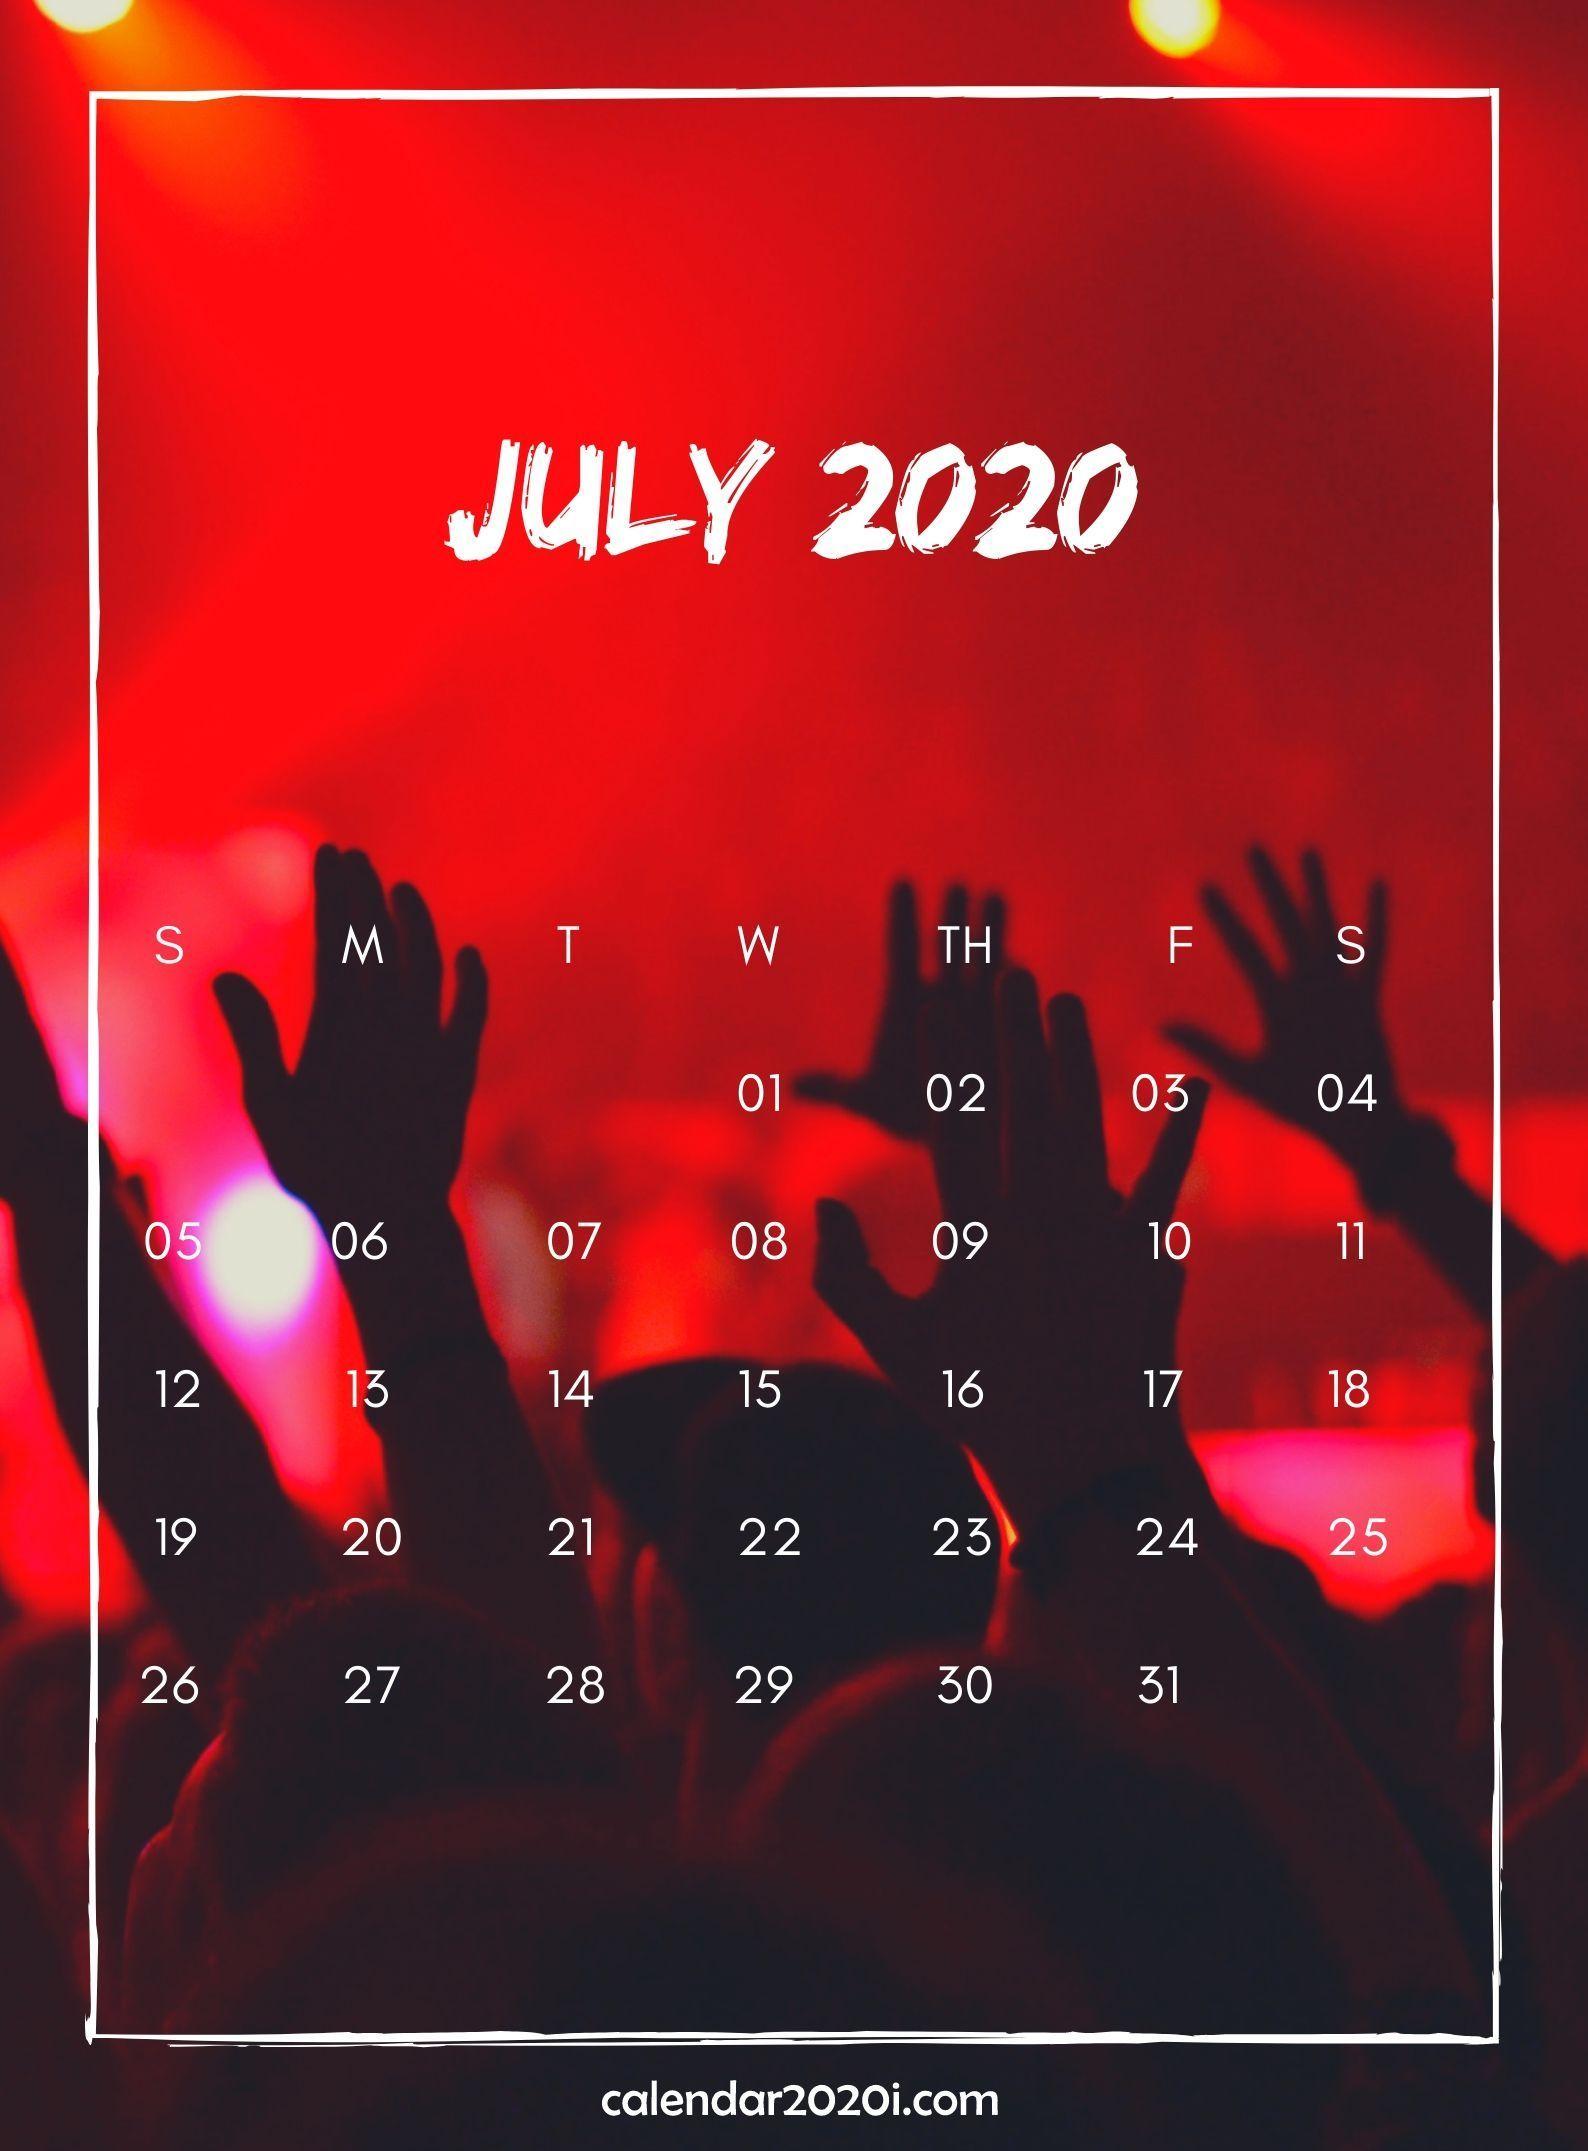 July 2020 Wall Calendar Printable 2020 Calendars Calendar 1588x2151